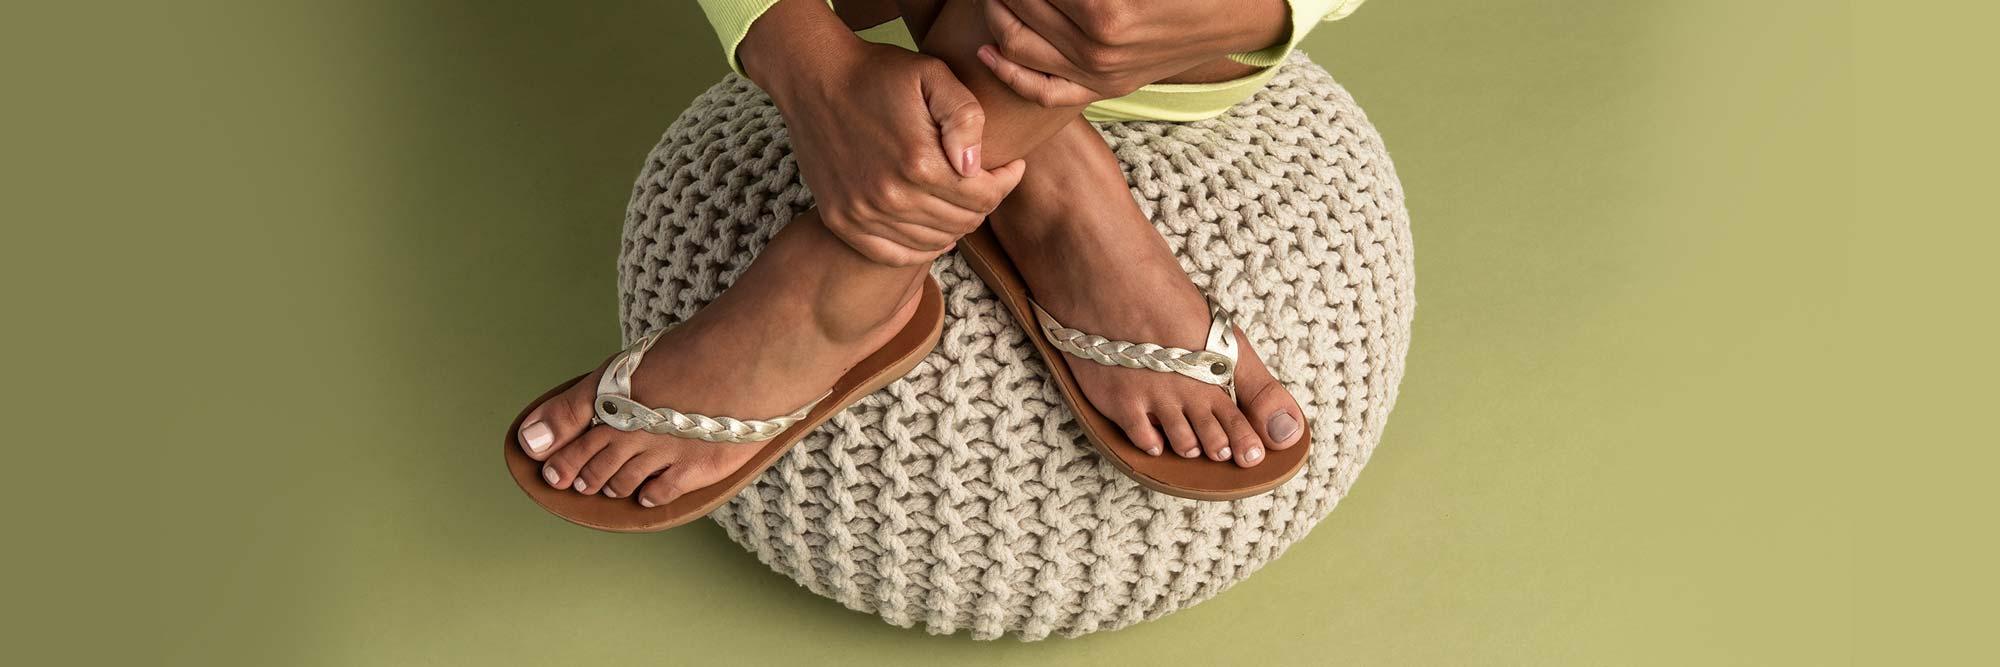 Close up of a woman's feet wearing Sanuk Sandals.